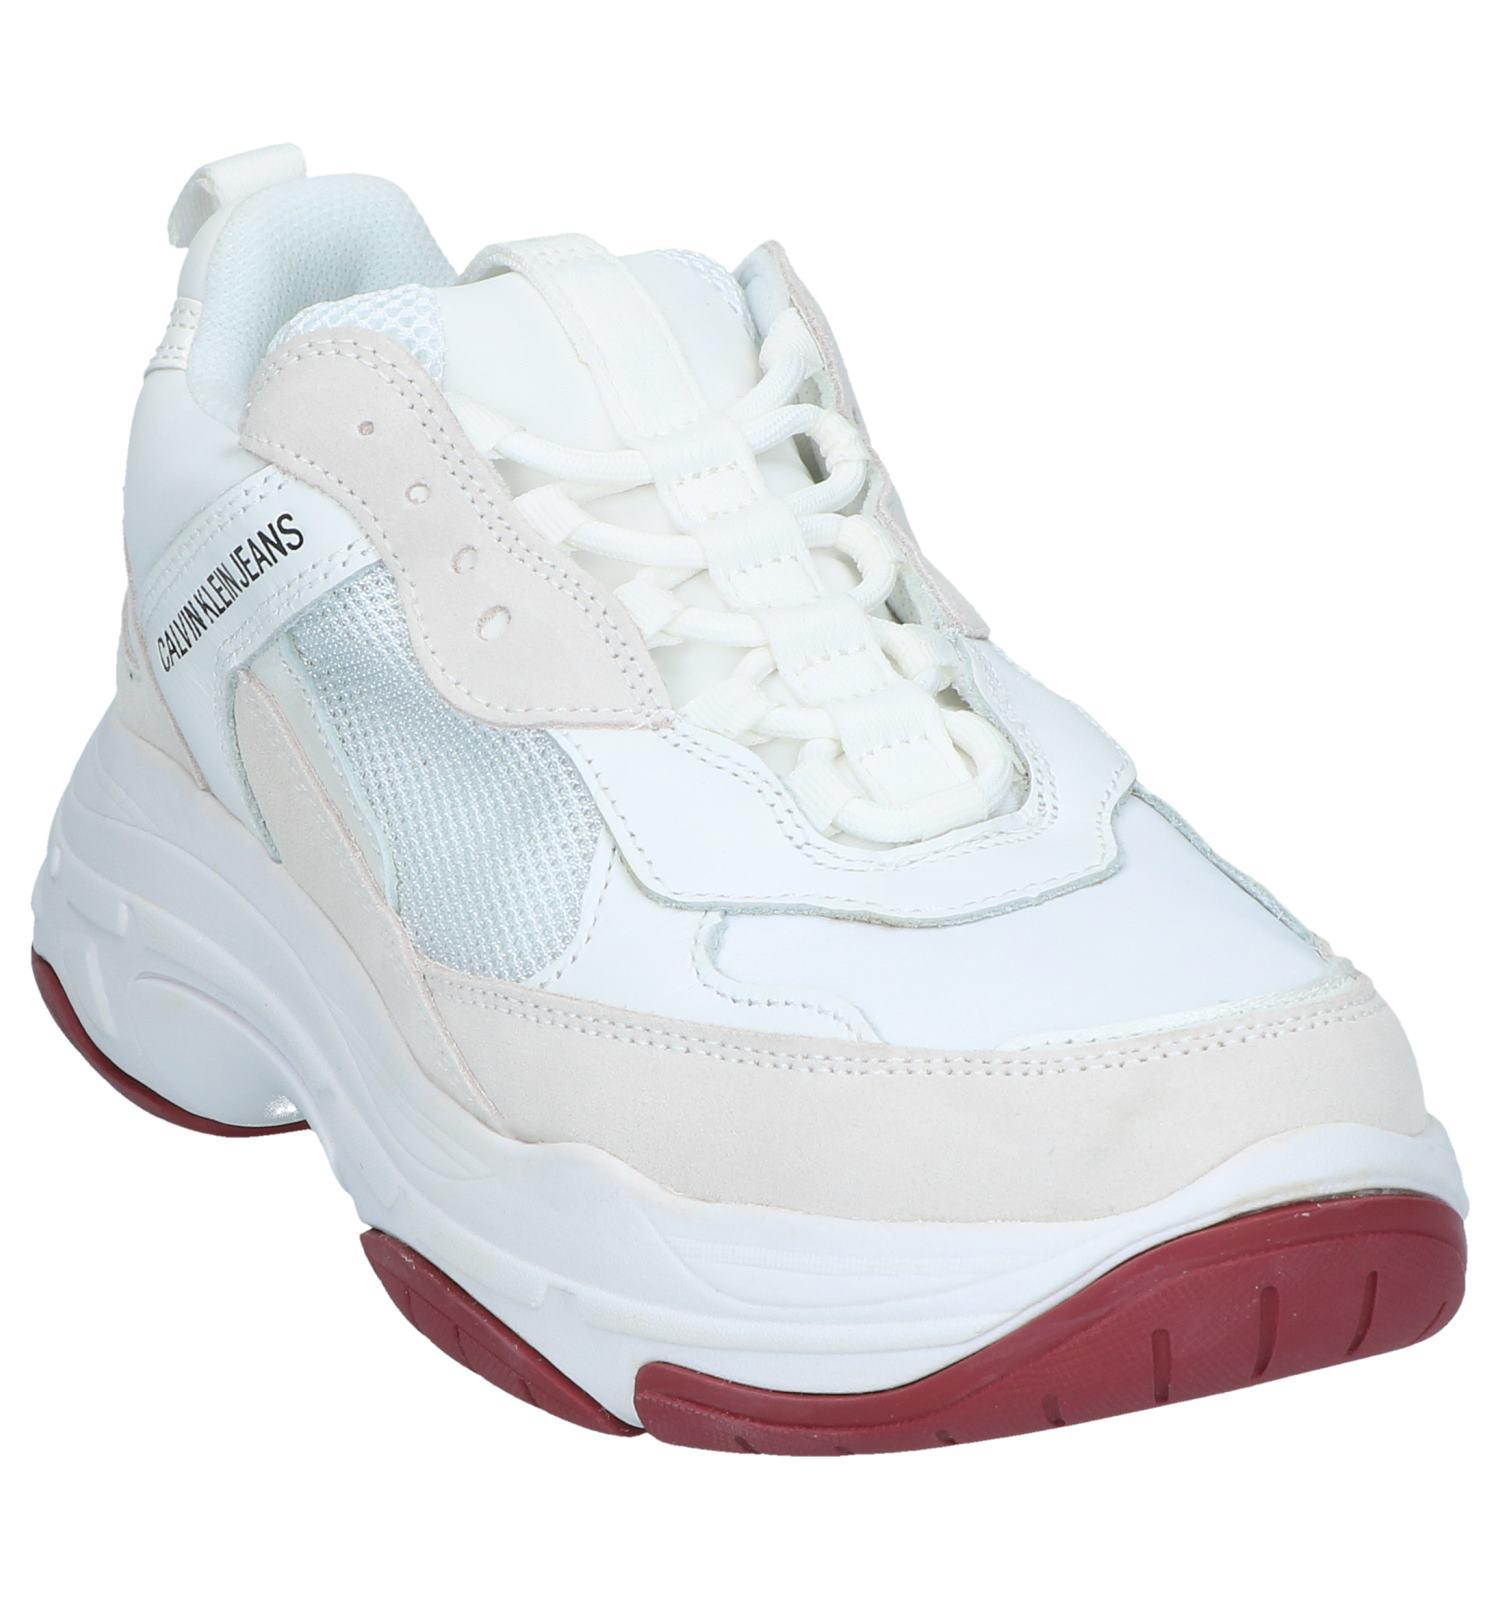 Gratis En MarvinTorfs Verzend Klein Witte Sneakers Retour Calvin be Rq3A4j5L